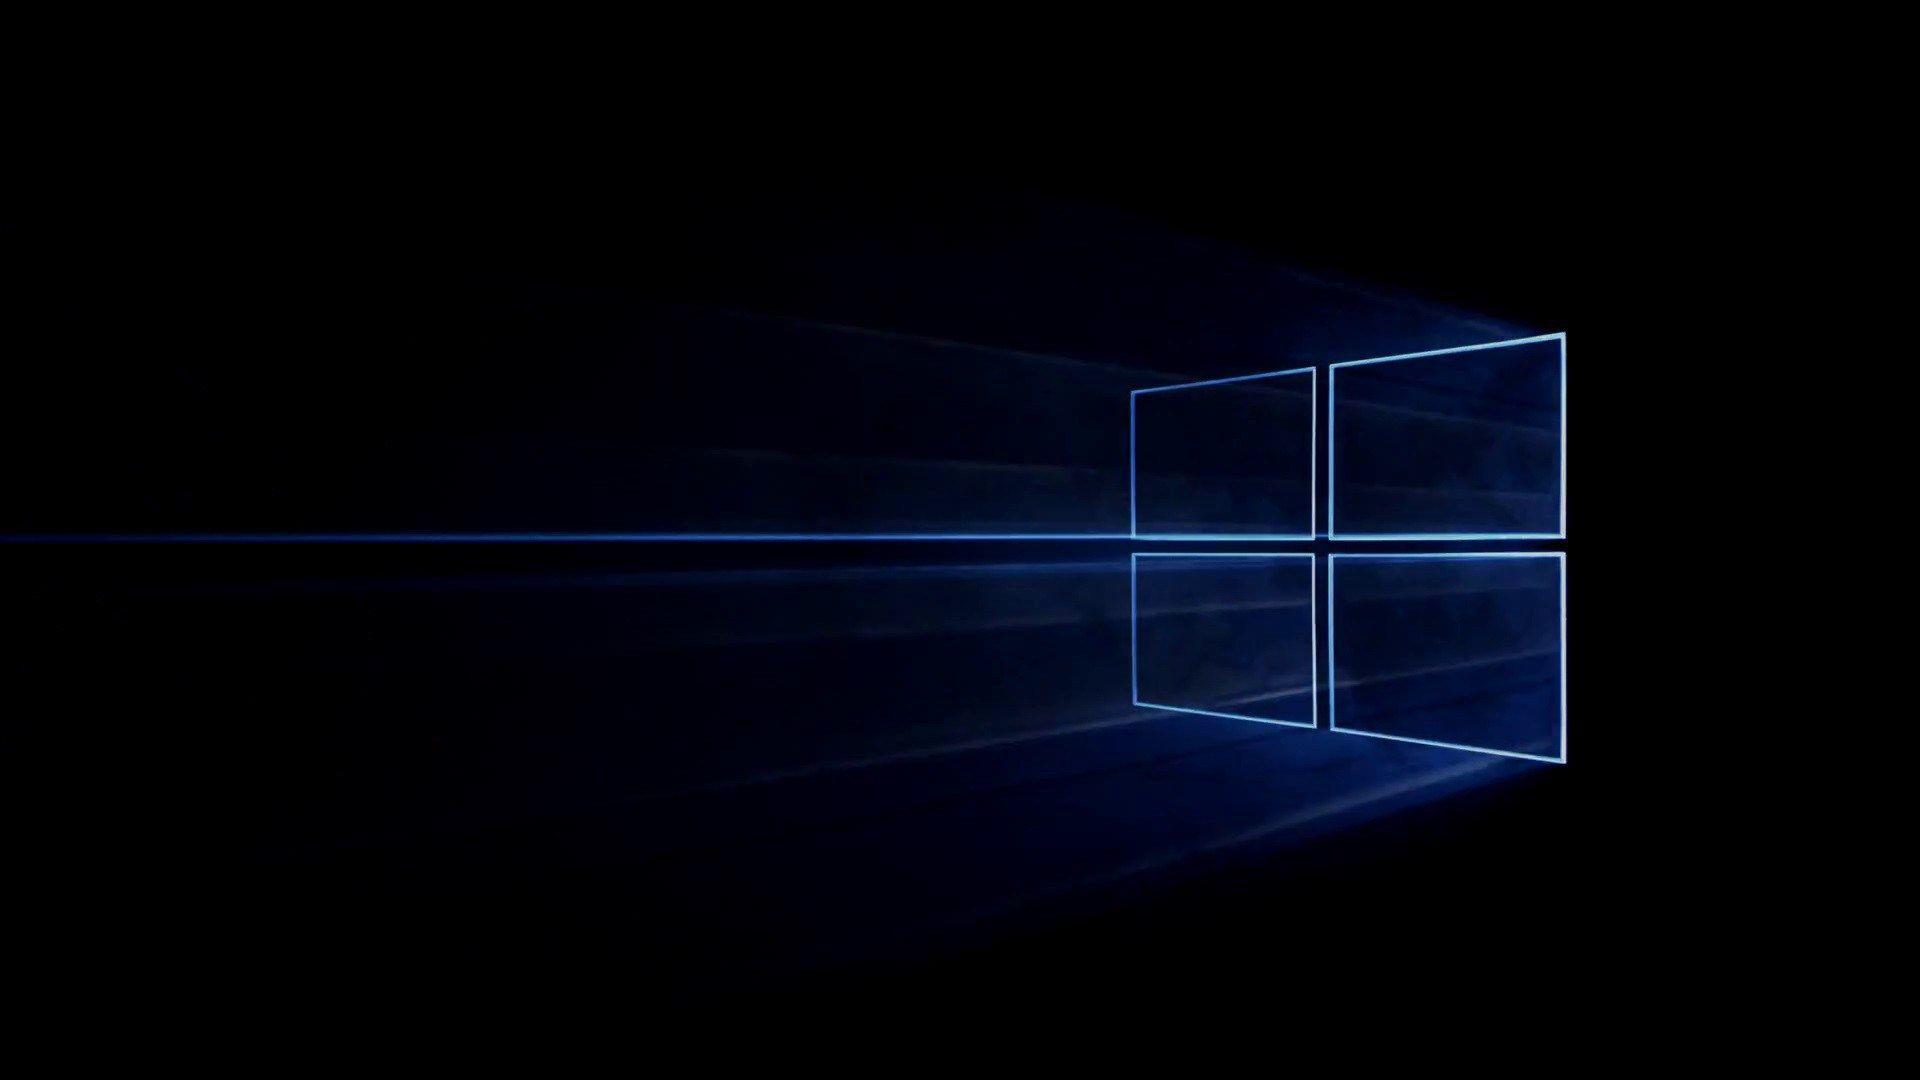 Free Animated Wallpaper Windows Wallpapers D Animated Free Wallpaper Windows 10 Windows Desktop Wallpaper Windows 10 Logo